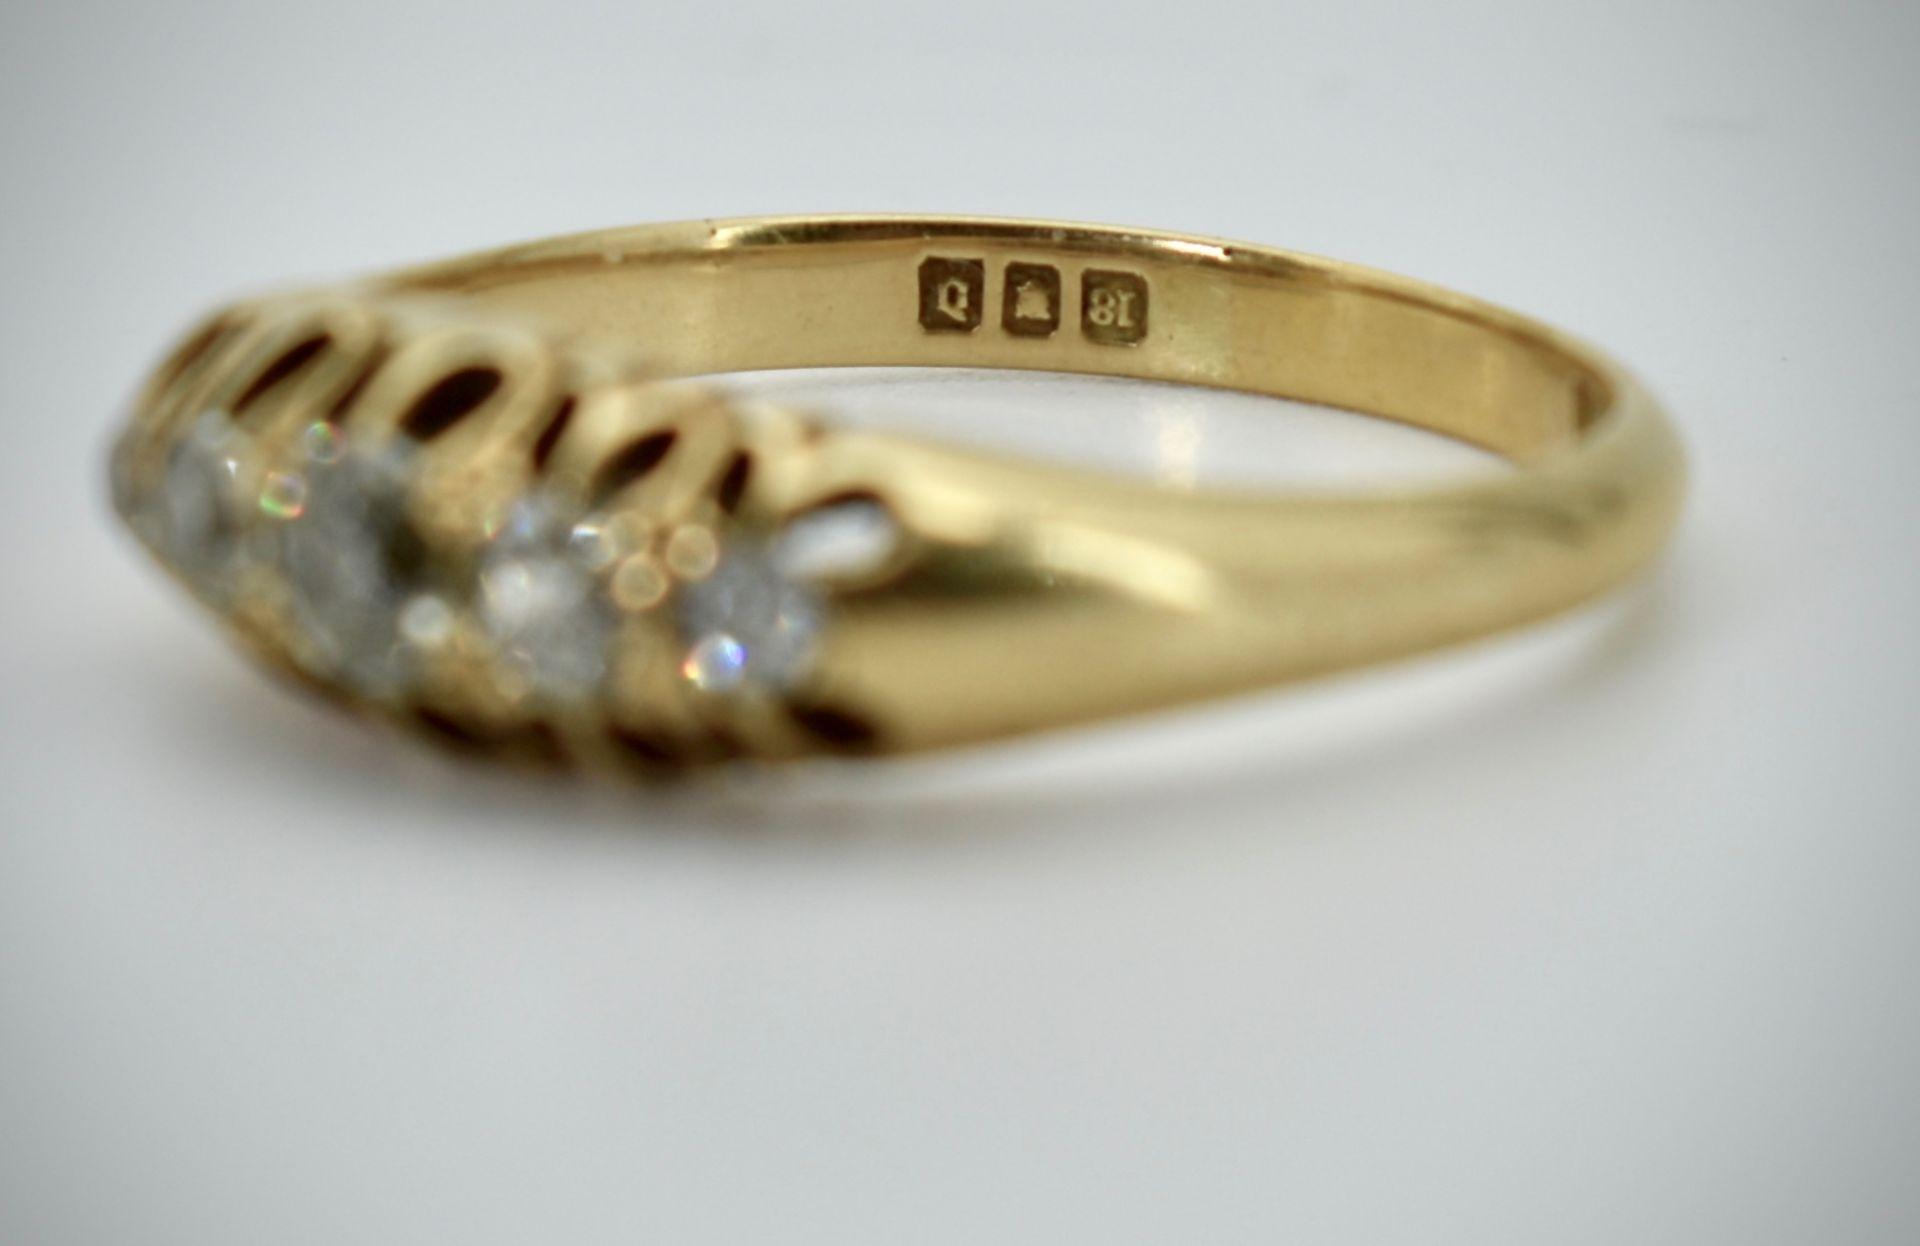 18ct Gold & Diamond Five Stone Hallmarked Ring - Image 2 of 3